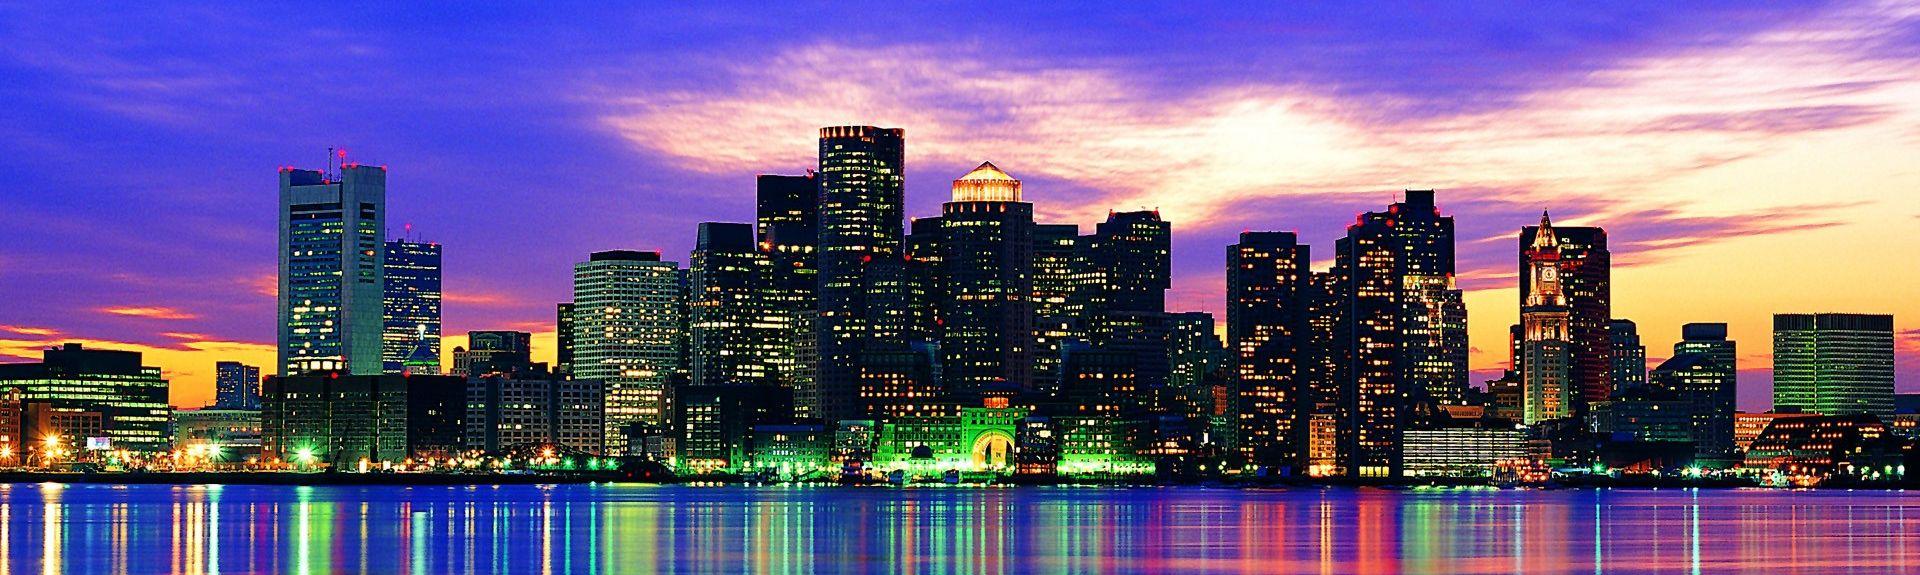 Fenway–Kenmore, Boston, Massachusetts, United States of America